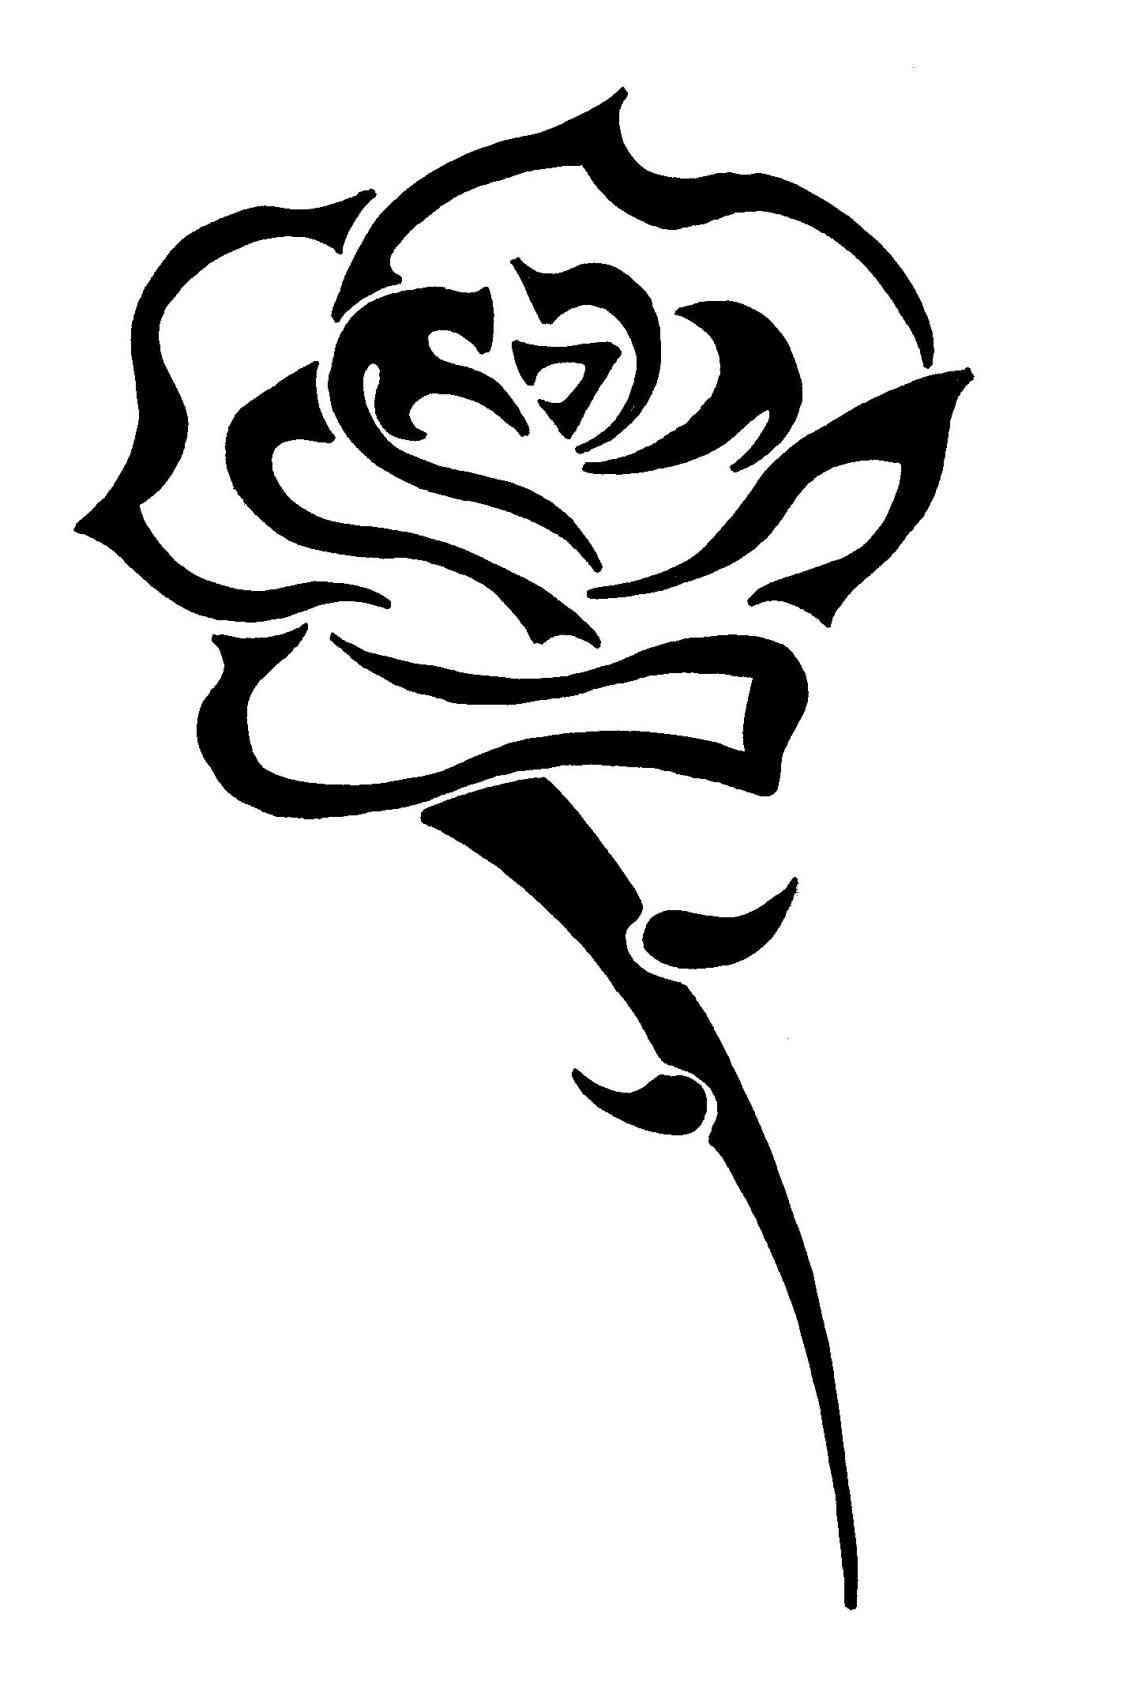 1142x1682 Vine Tattoo Designs Tattoo Ideas Gothic Danielhuscroftcom Vines